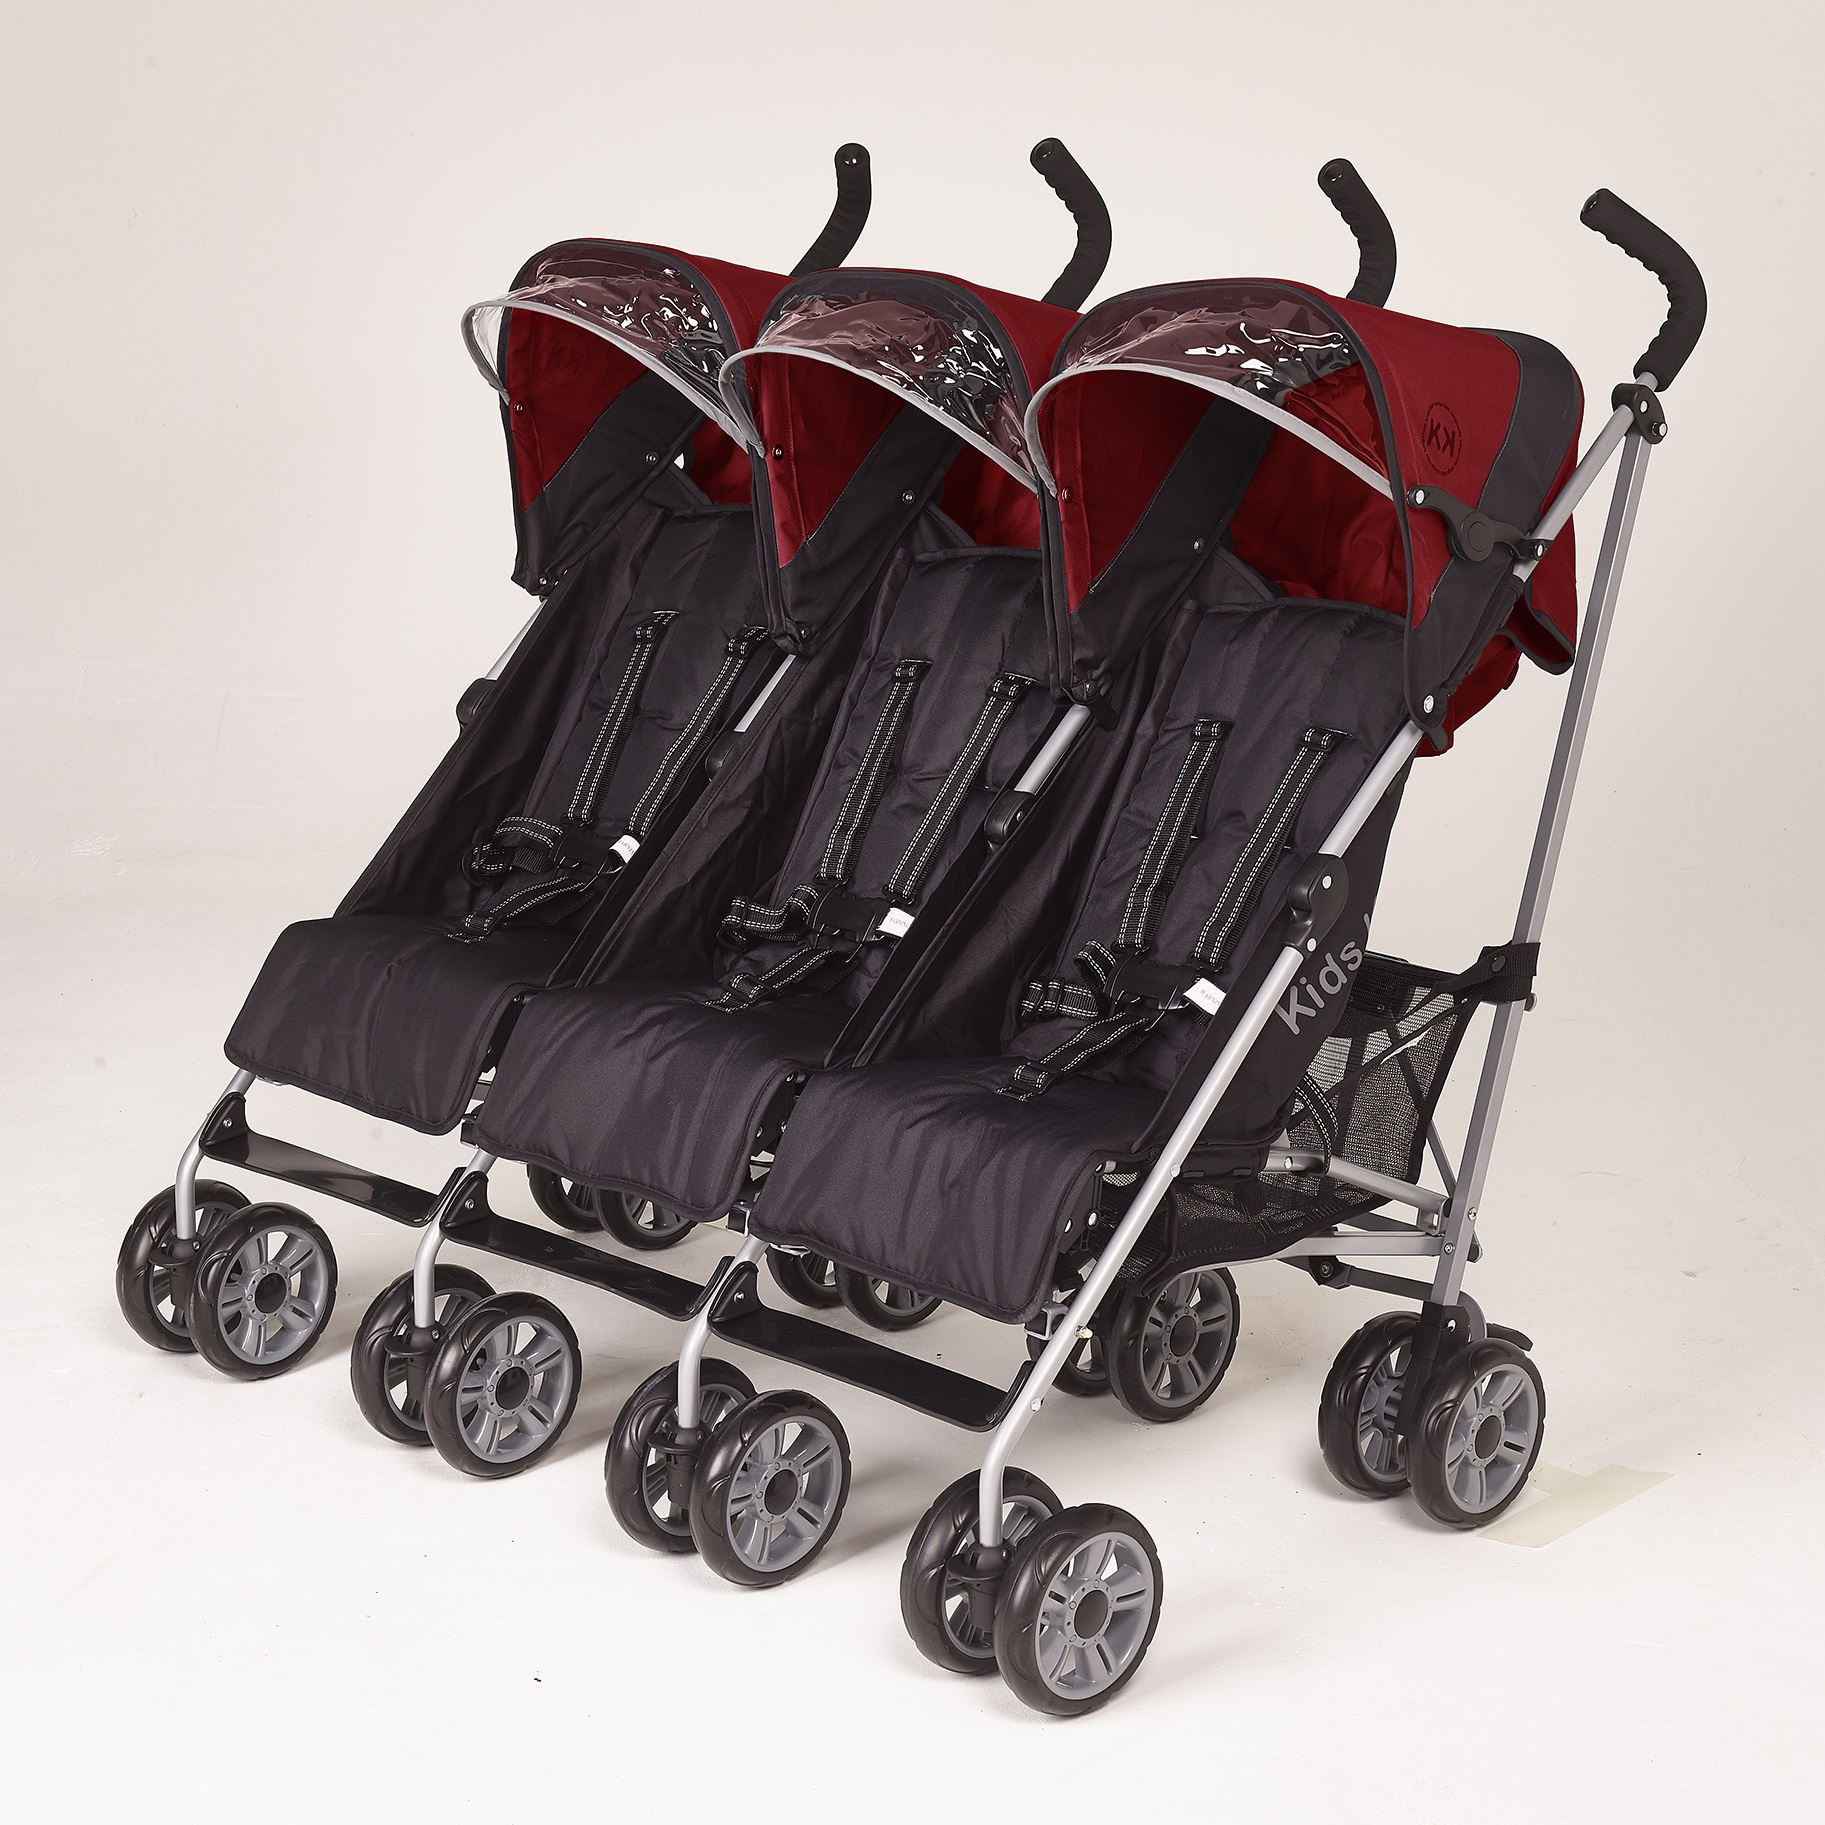 Kids-kargo-citi-elite-triple-stroller-red-smart-kid-store